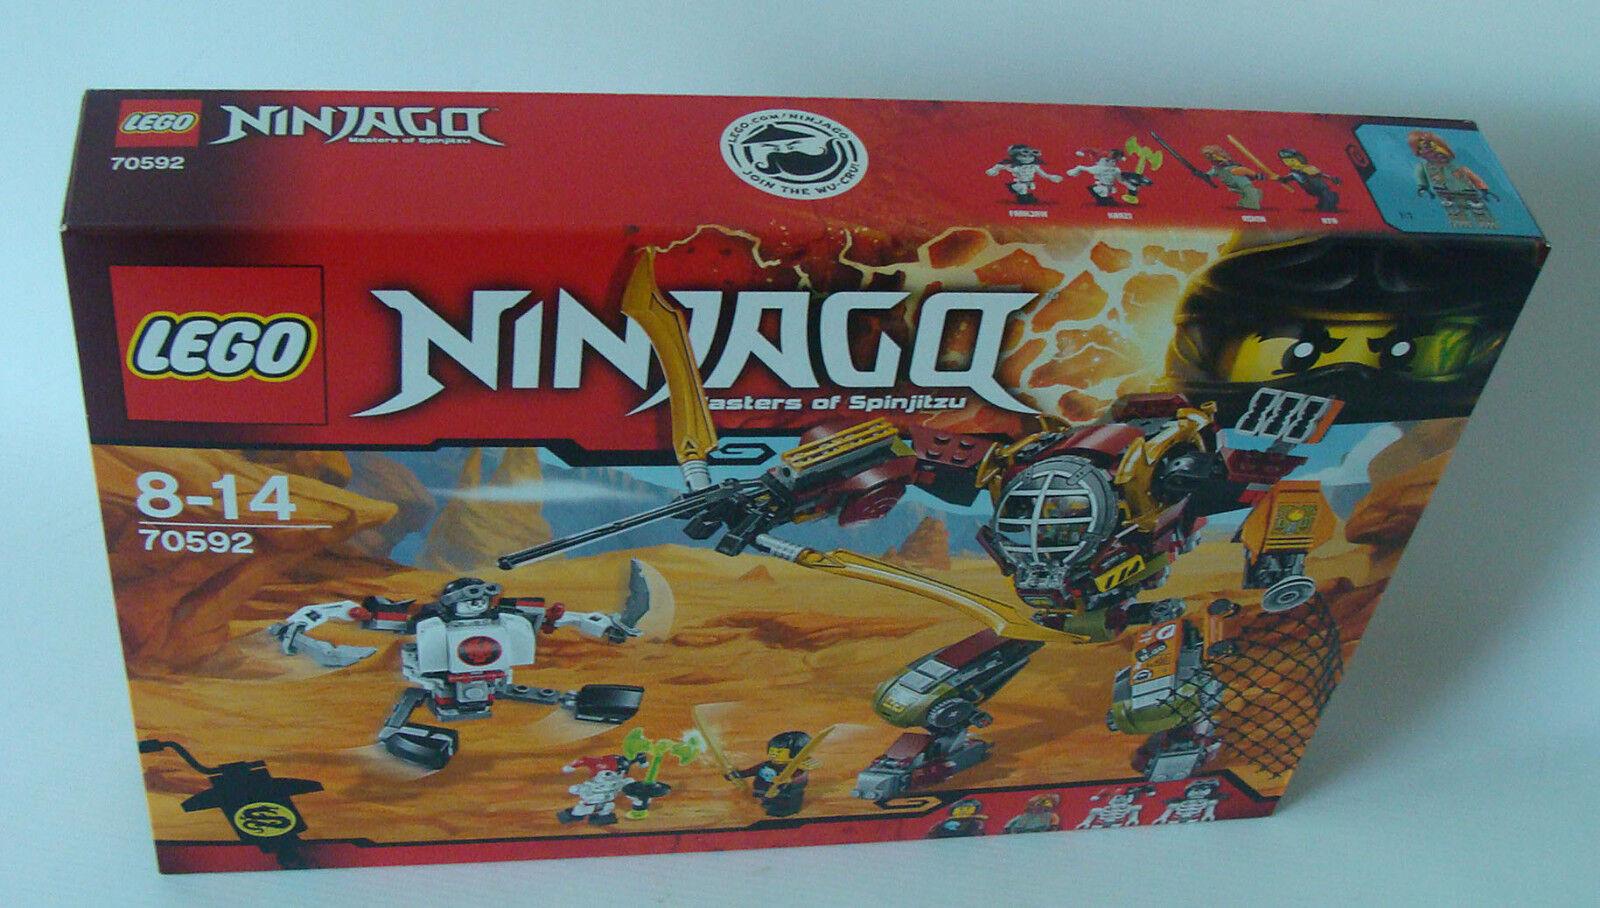 Lego® Ninjago 70592 - Schatzgräber M.E.C. 439 Teile 8-14 Jahren - Neu